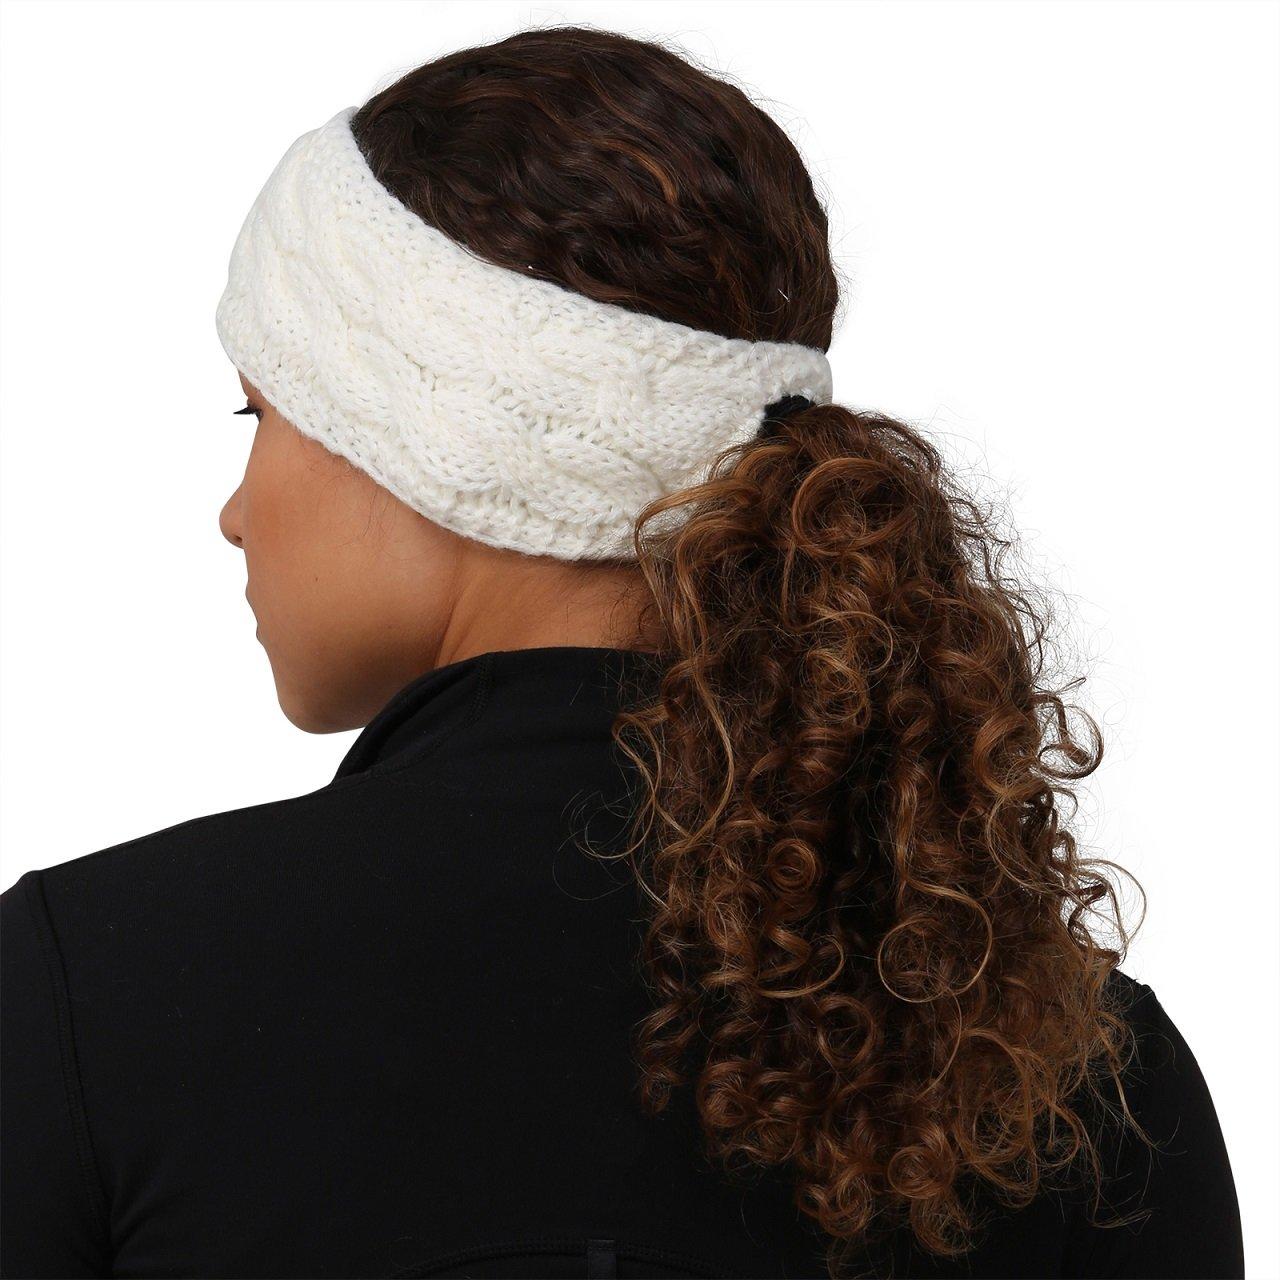 punto Cinta de bufanda Trailheads con orificio para coleta